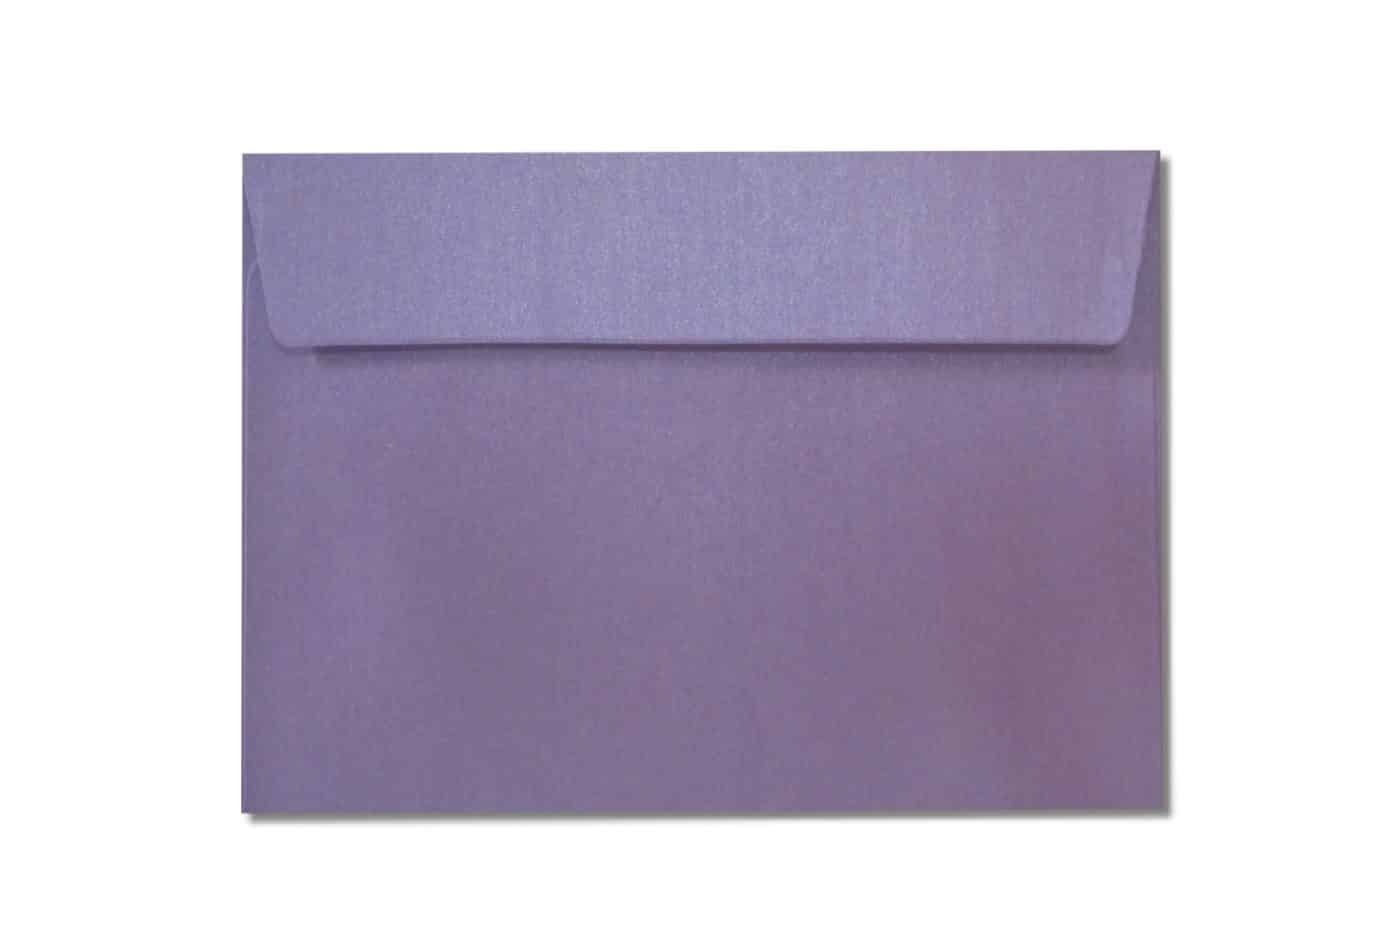 c6 metallic purple envelopes